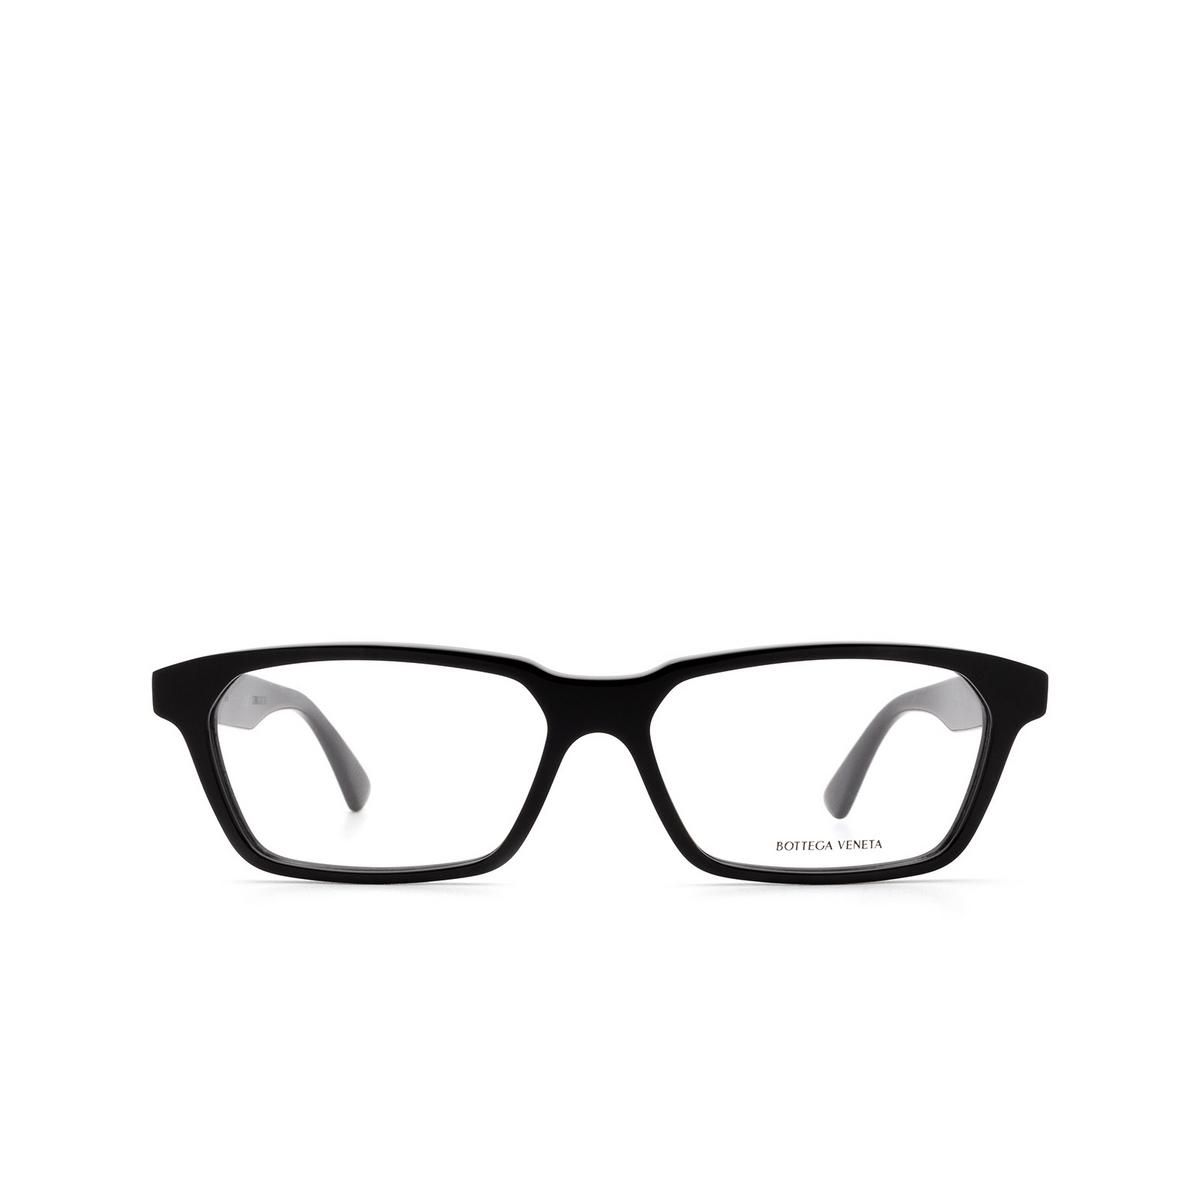 Bottega Veneta® Rectangle Eyeglasses: BV1098O color Black 001 - front view.